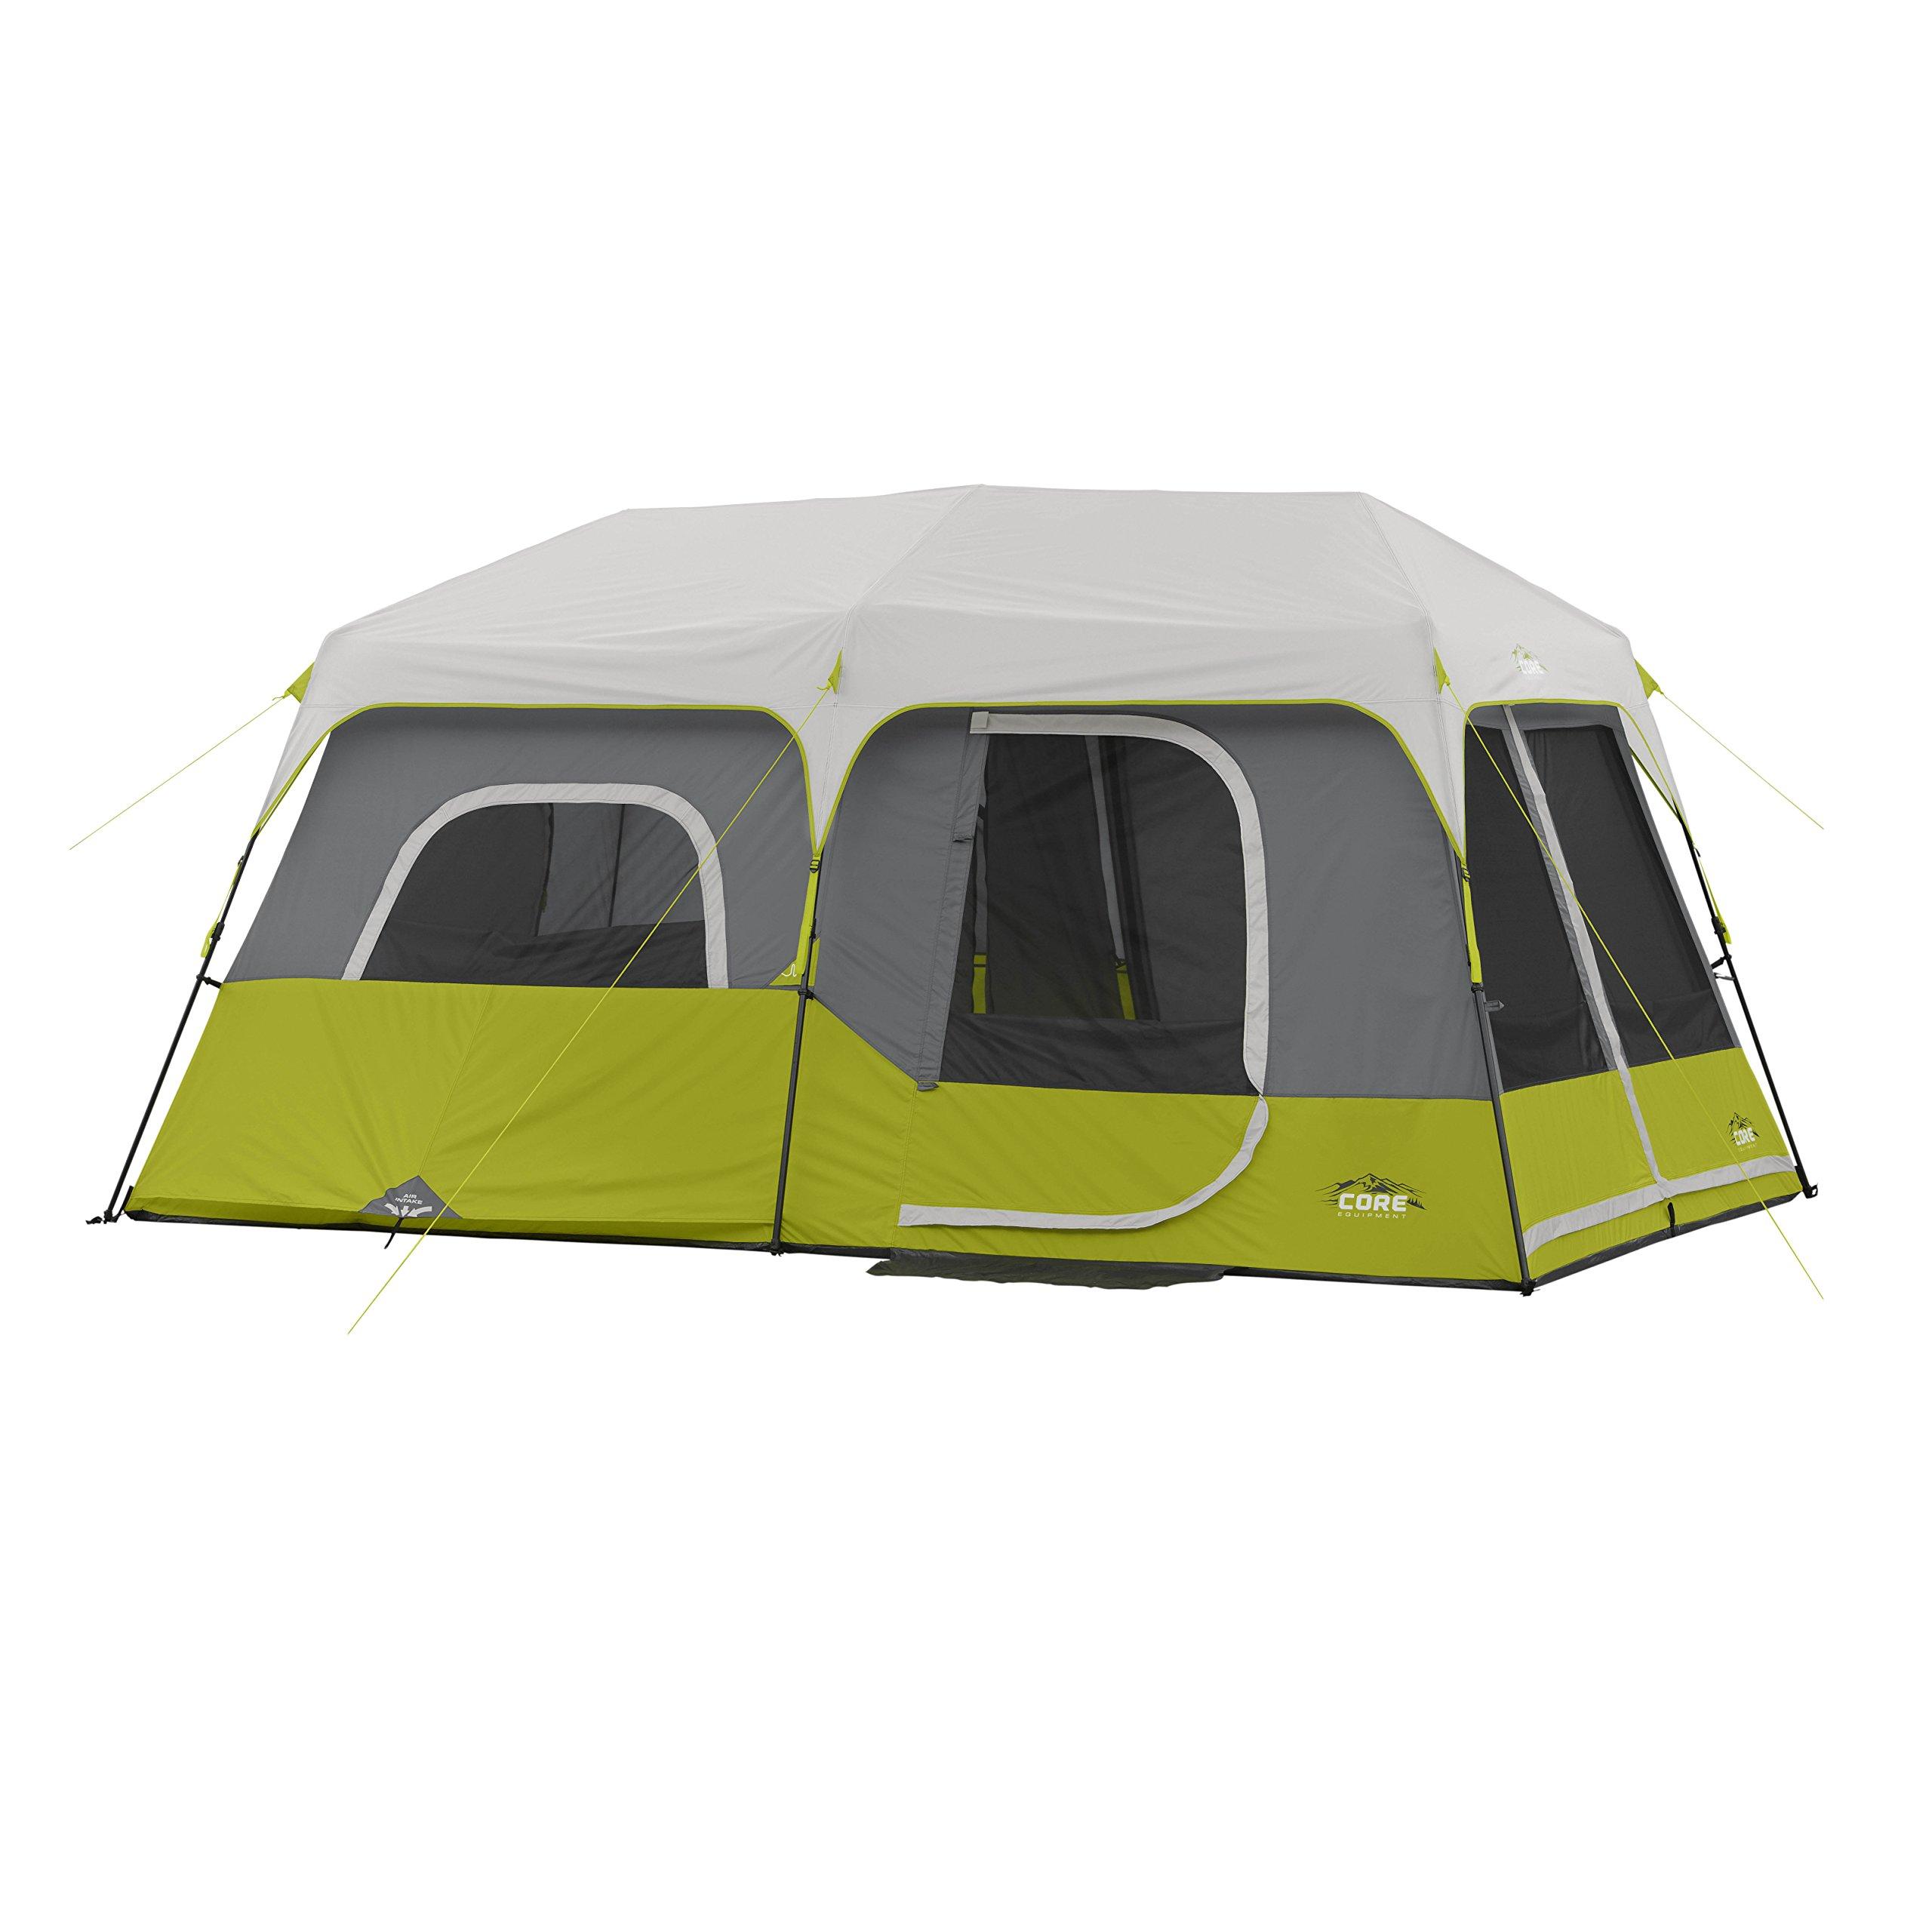 CORE 9P Instant Cabin Tent  sc 1 st  Amazon.com & Easy Up Camping Tents: Amazon.com